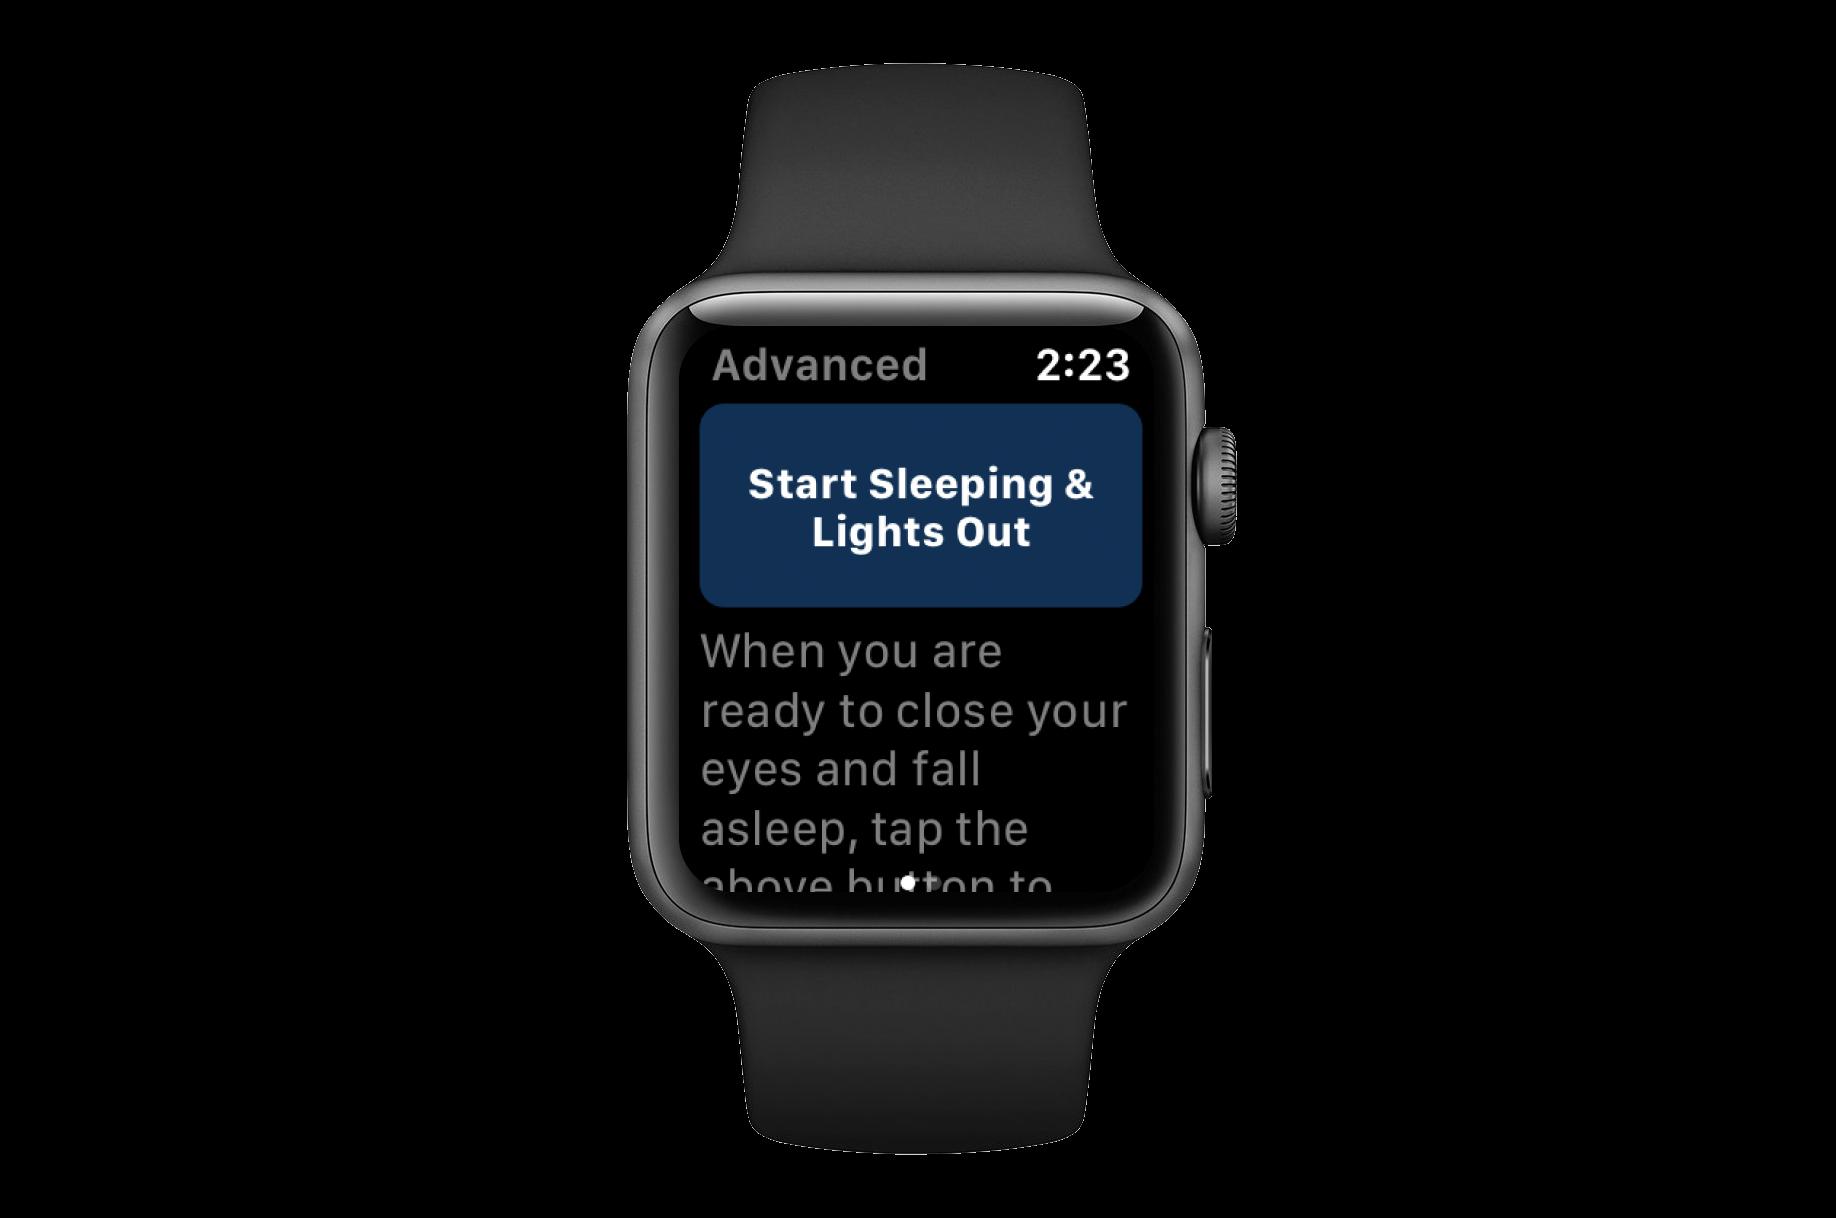 sleepwatch_by_bodymatter_advanced_tracking_mode_1.png